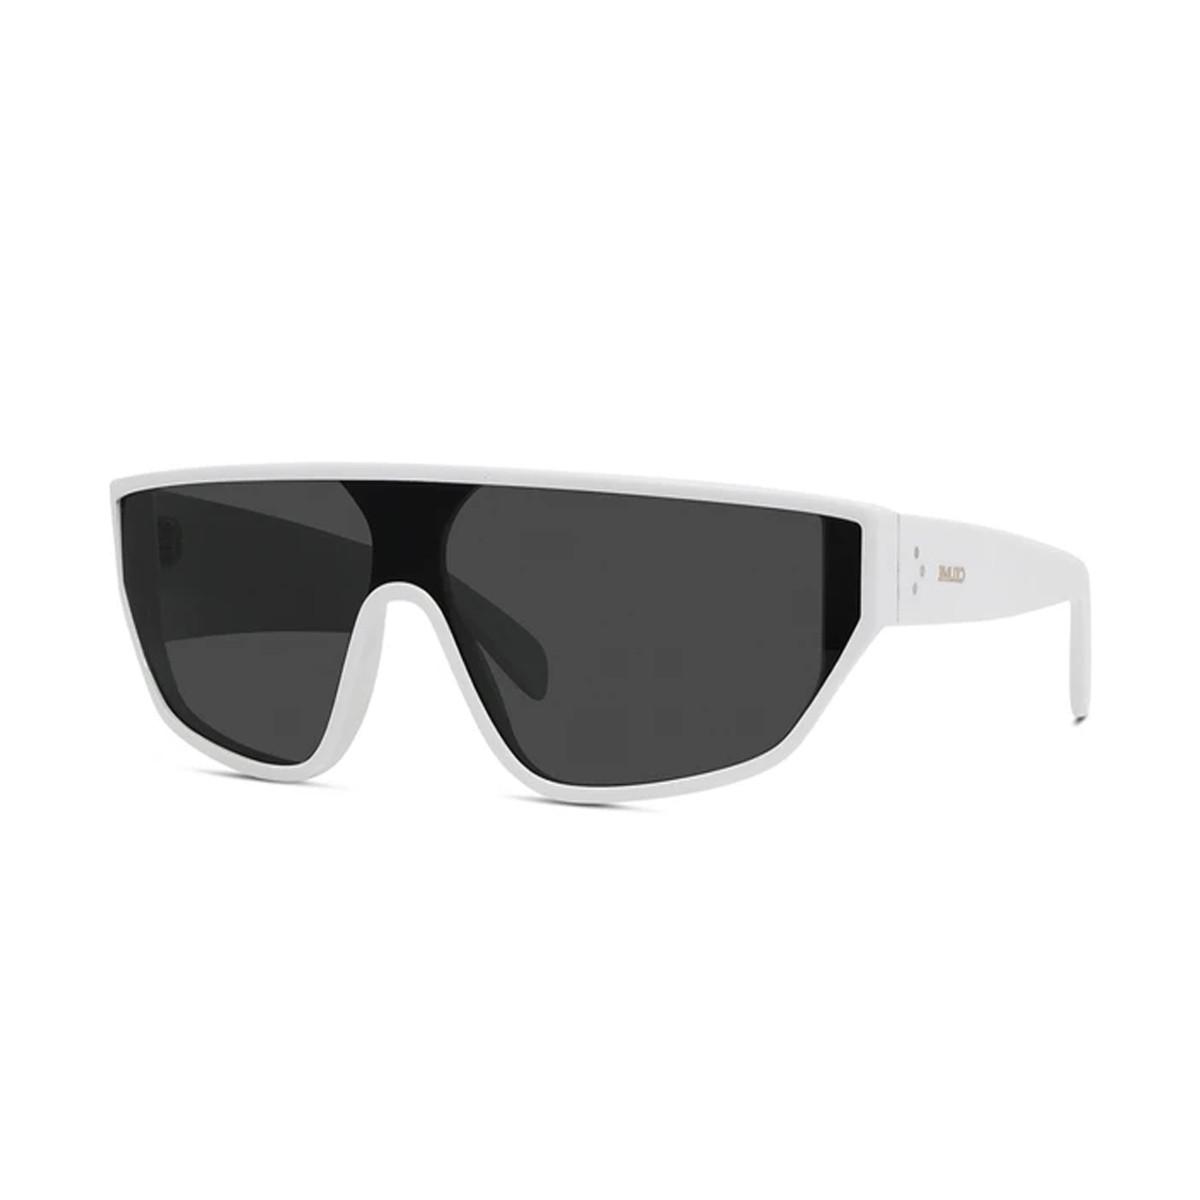 CL40195I   Unisex sunglasses